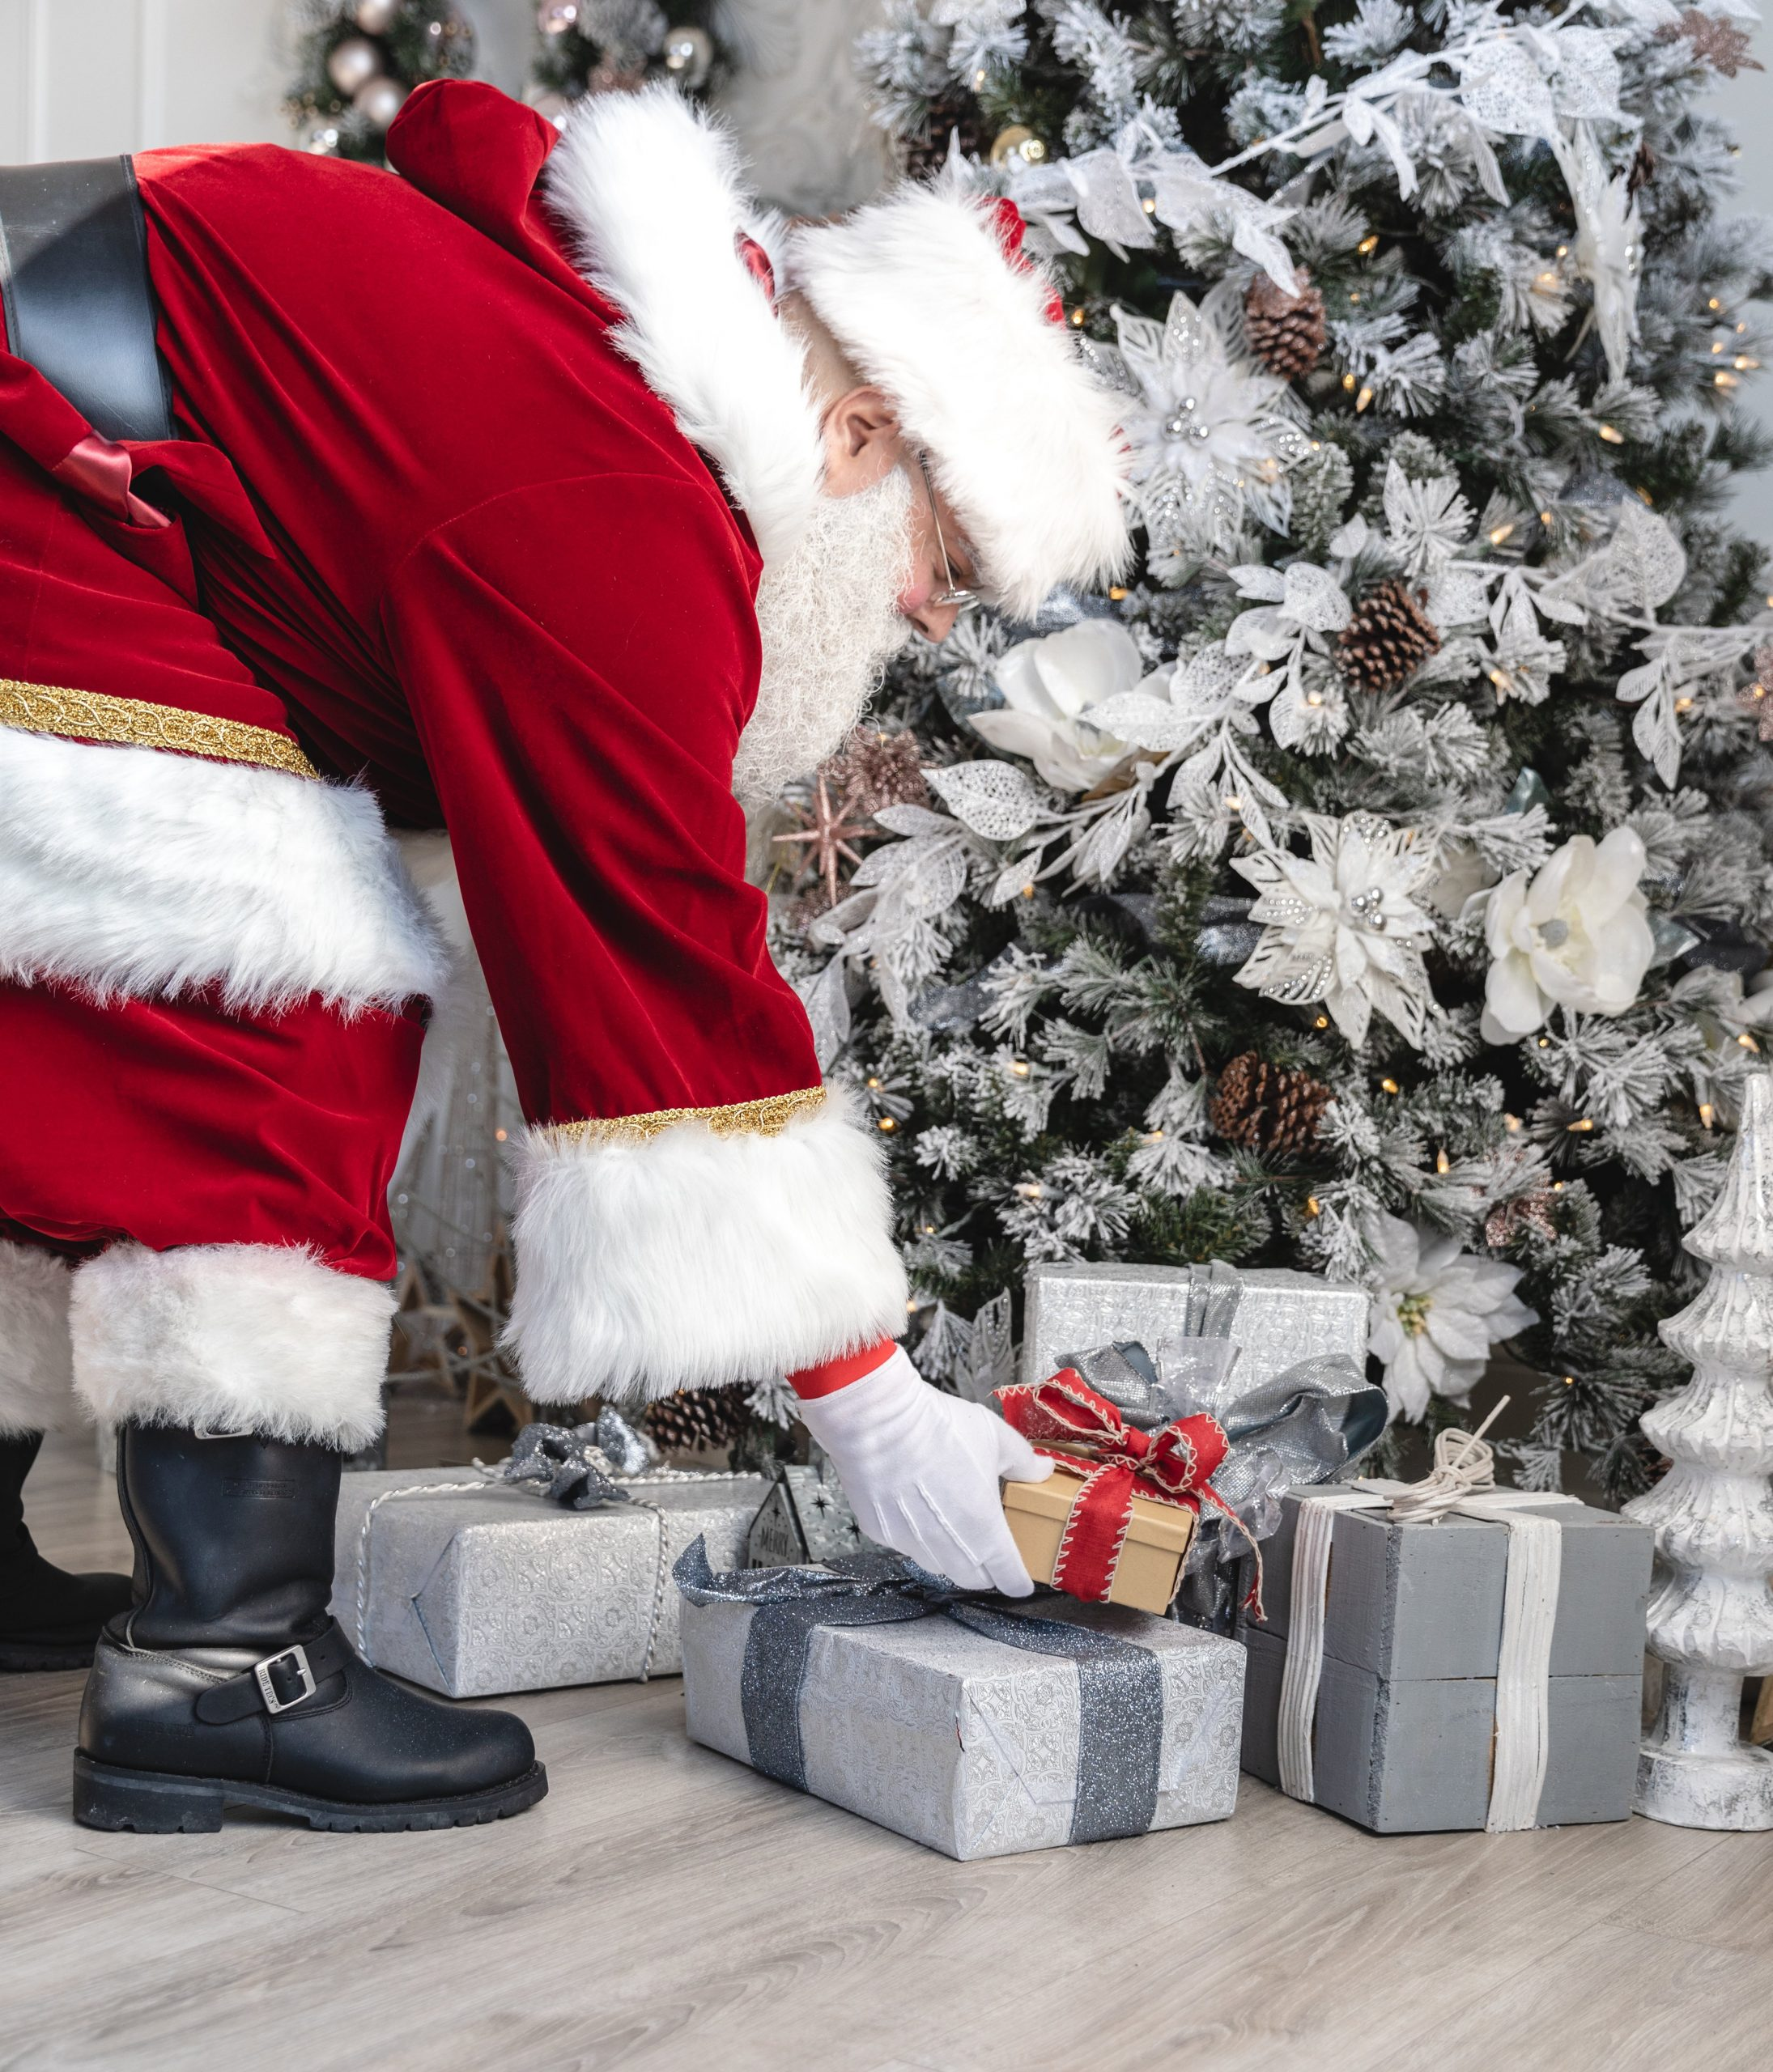 Image of santa placing gifts under a tree